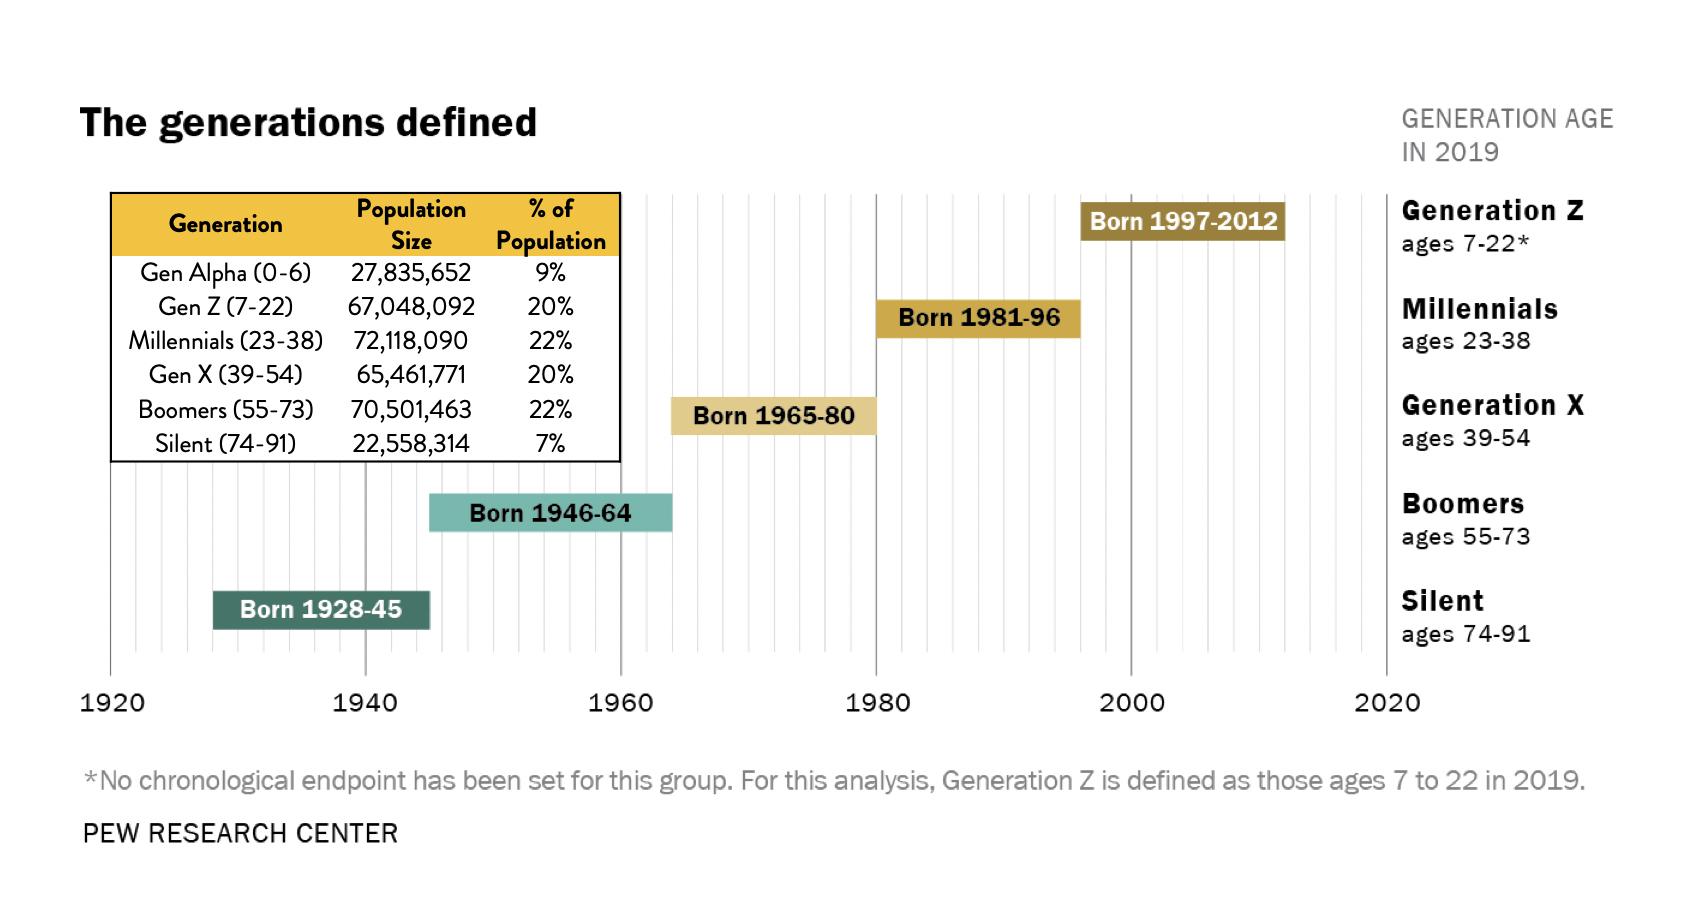 Pew Research Center and US Census Bureau 2018 Population Estimates